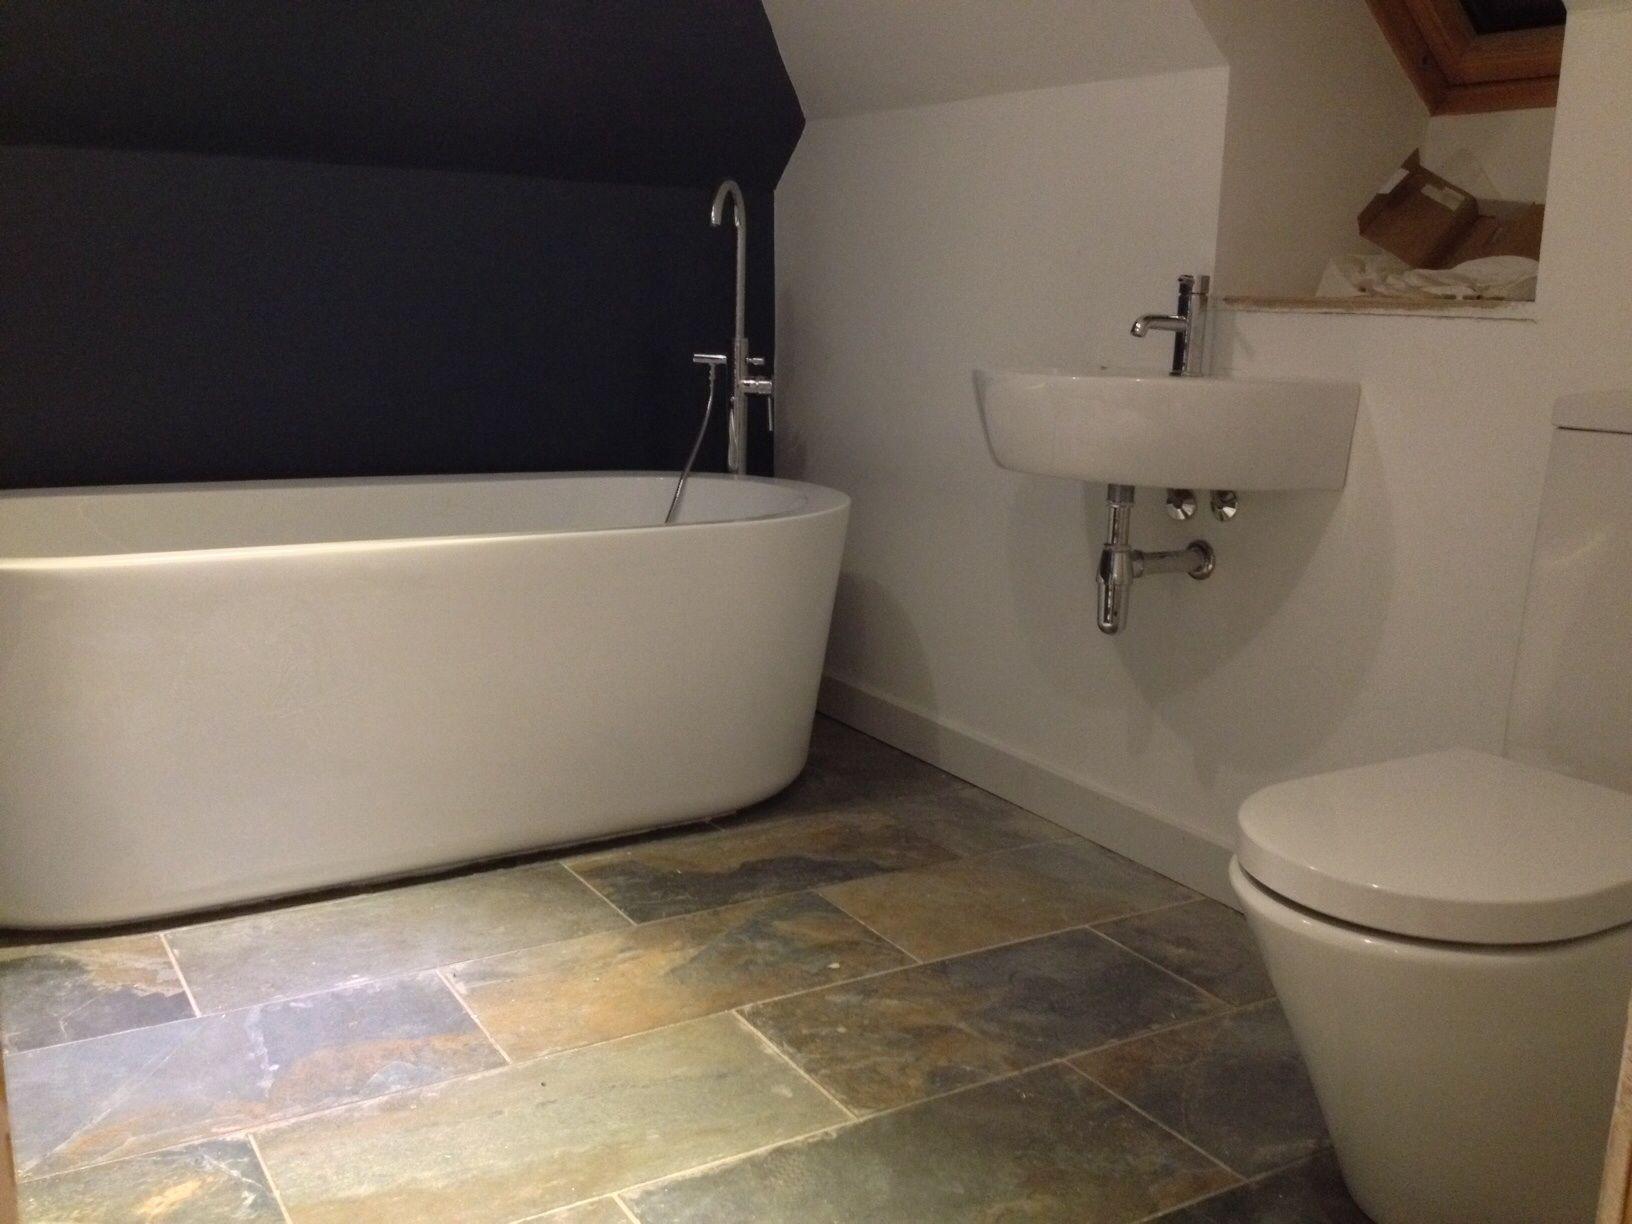 sensational plum bathroom accessories image-Cool Plum Bathroom Accessories Image